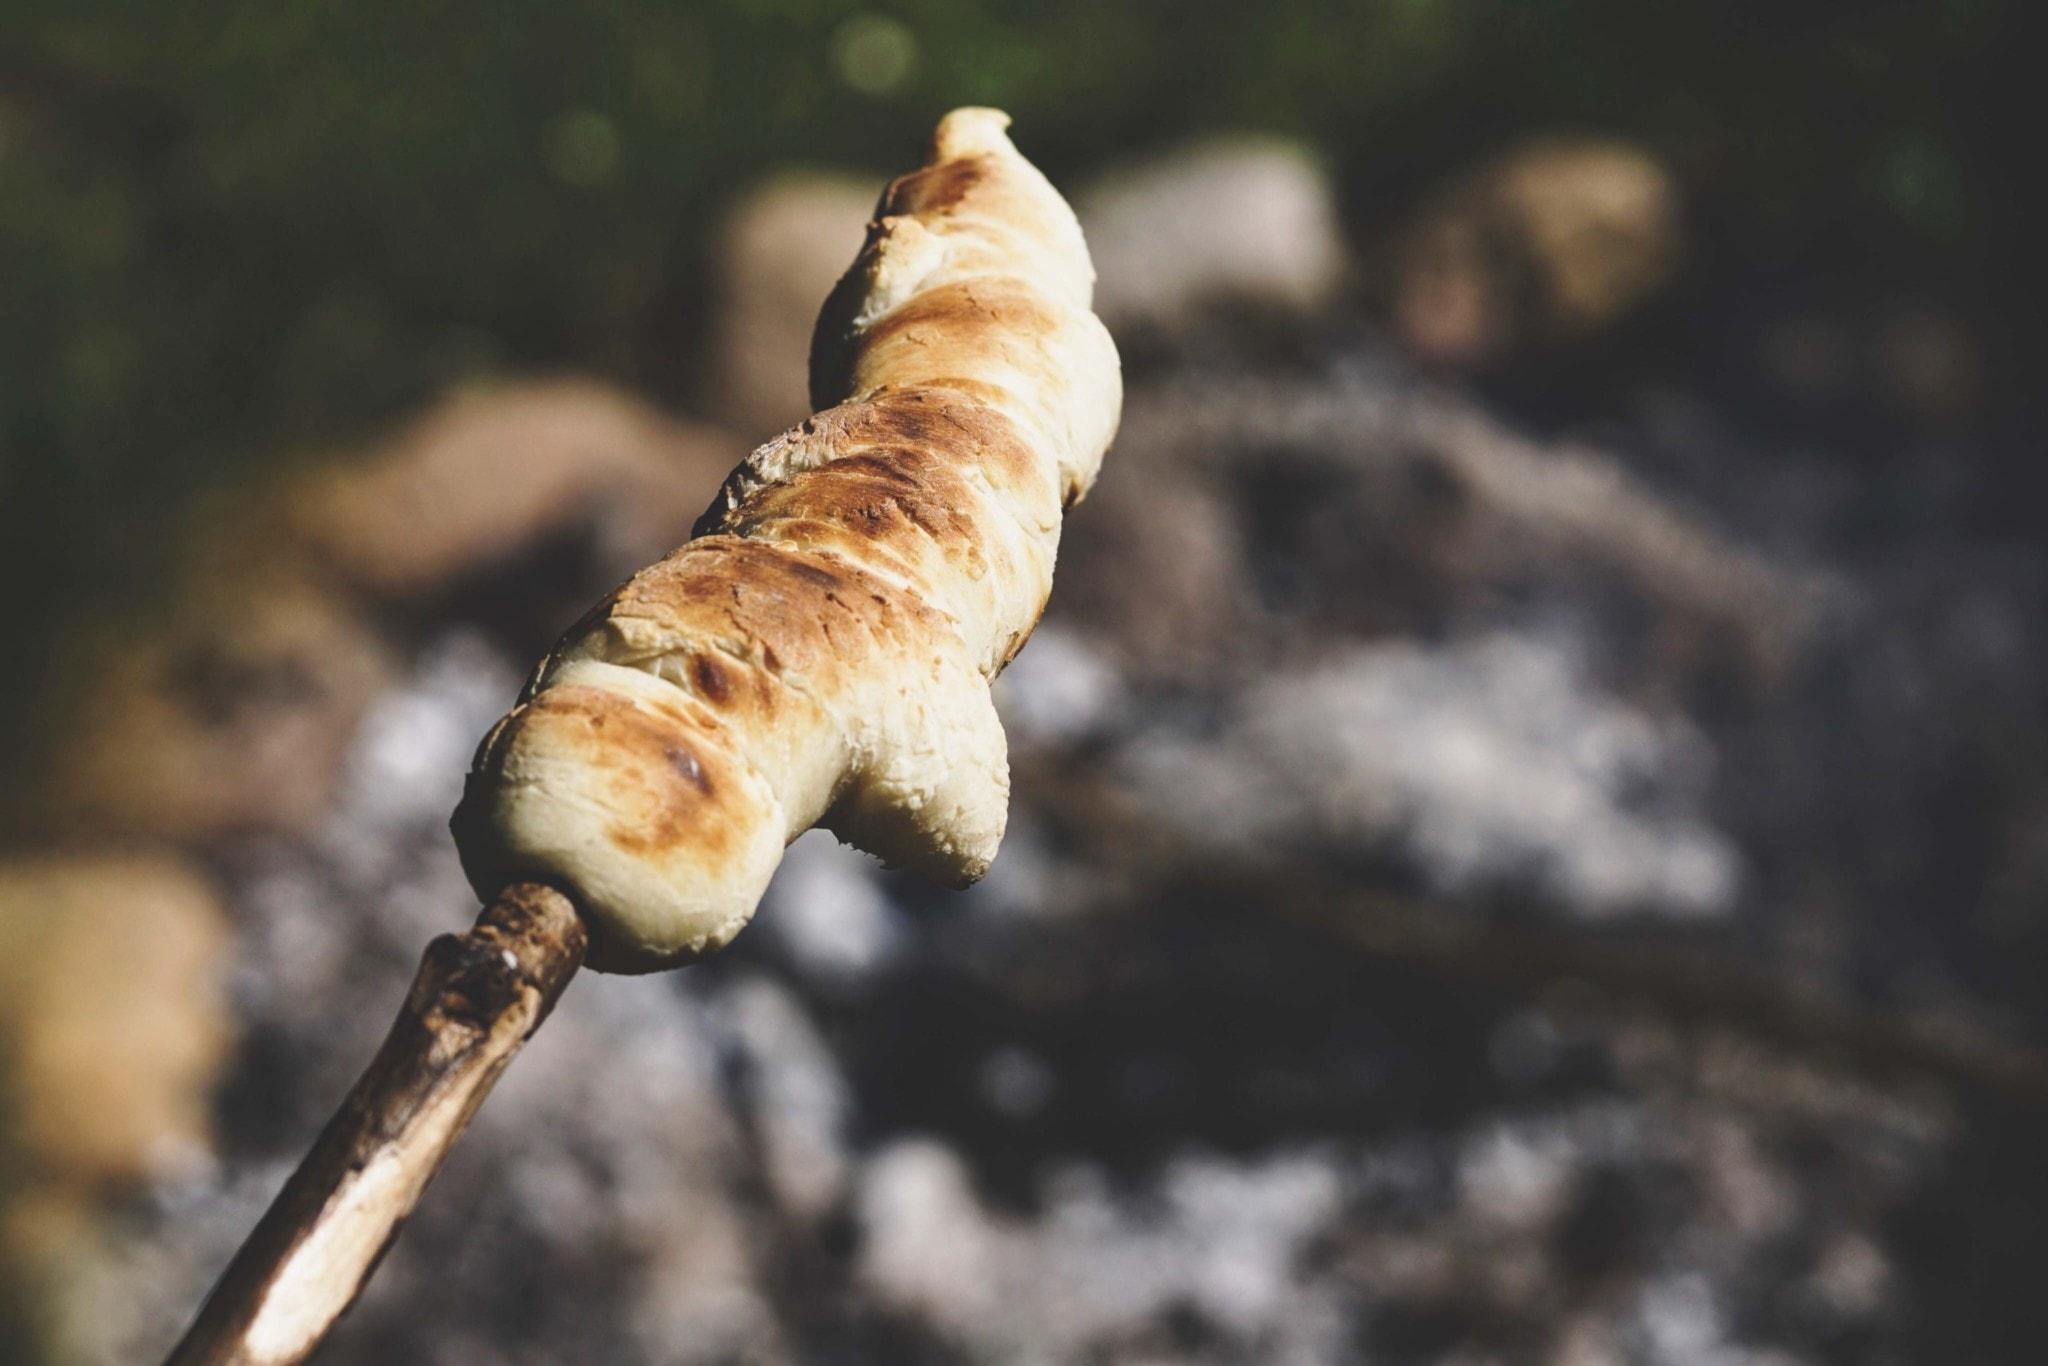 Brot am Stock über Feuer.